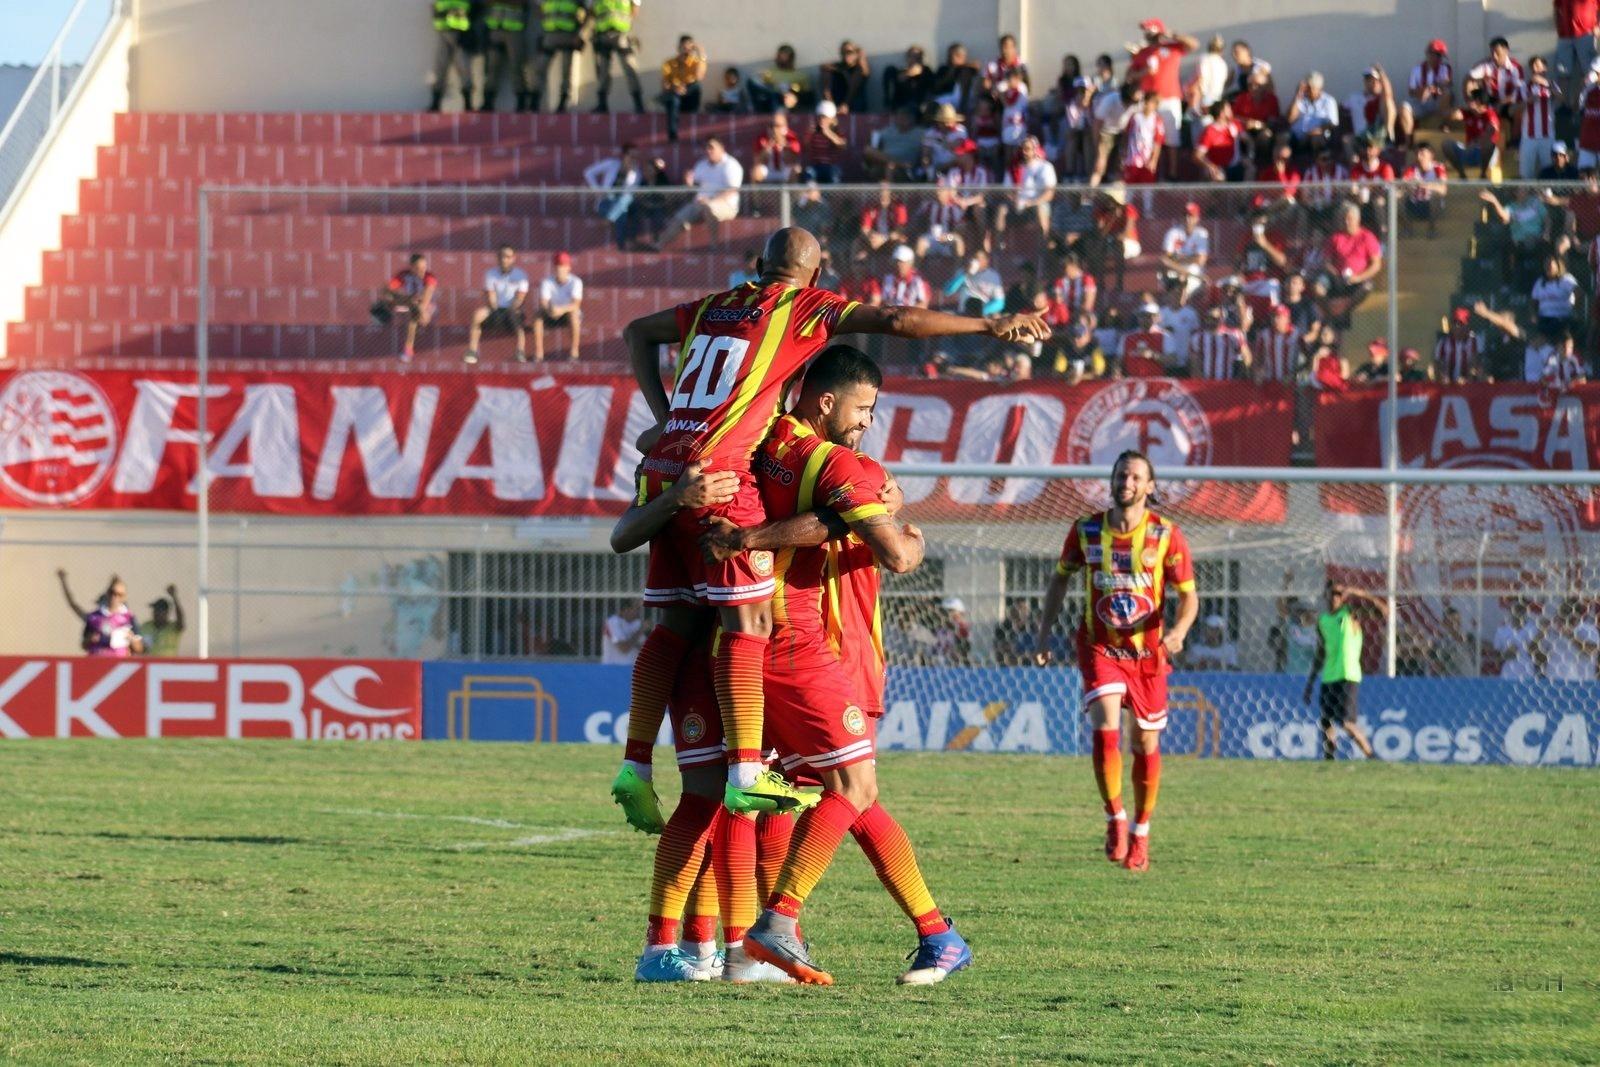 Juazeirense comemora gol diante do Náutico na Série C do Campeonato Brasileiro 2018